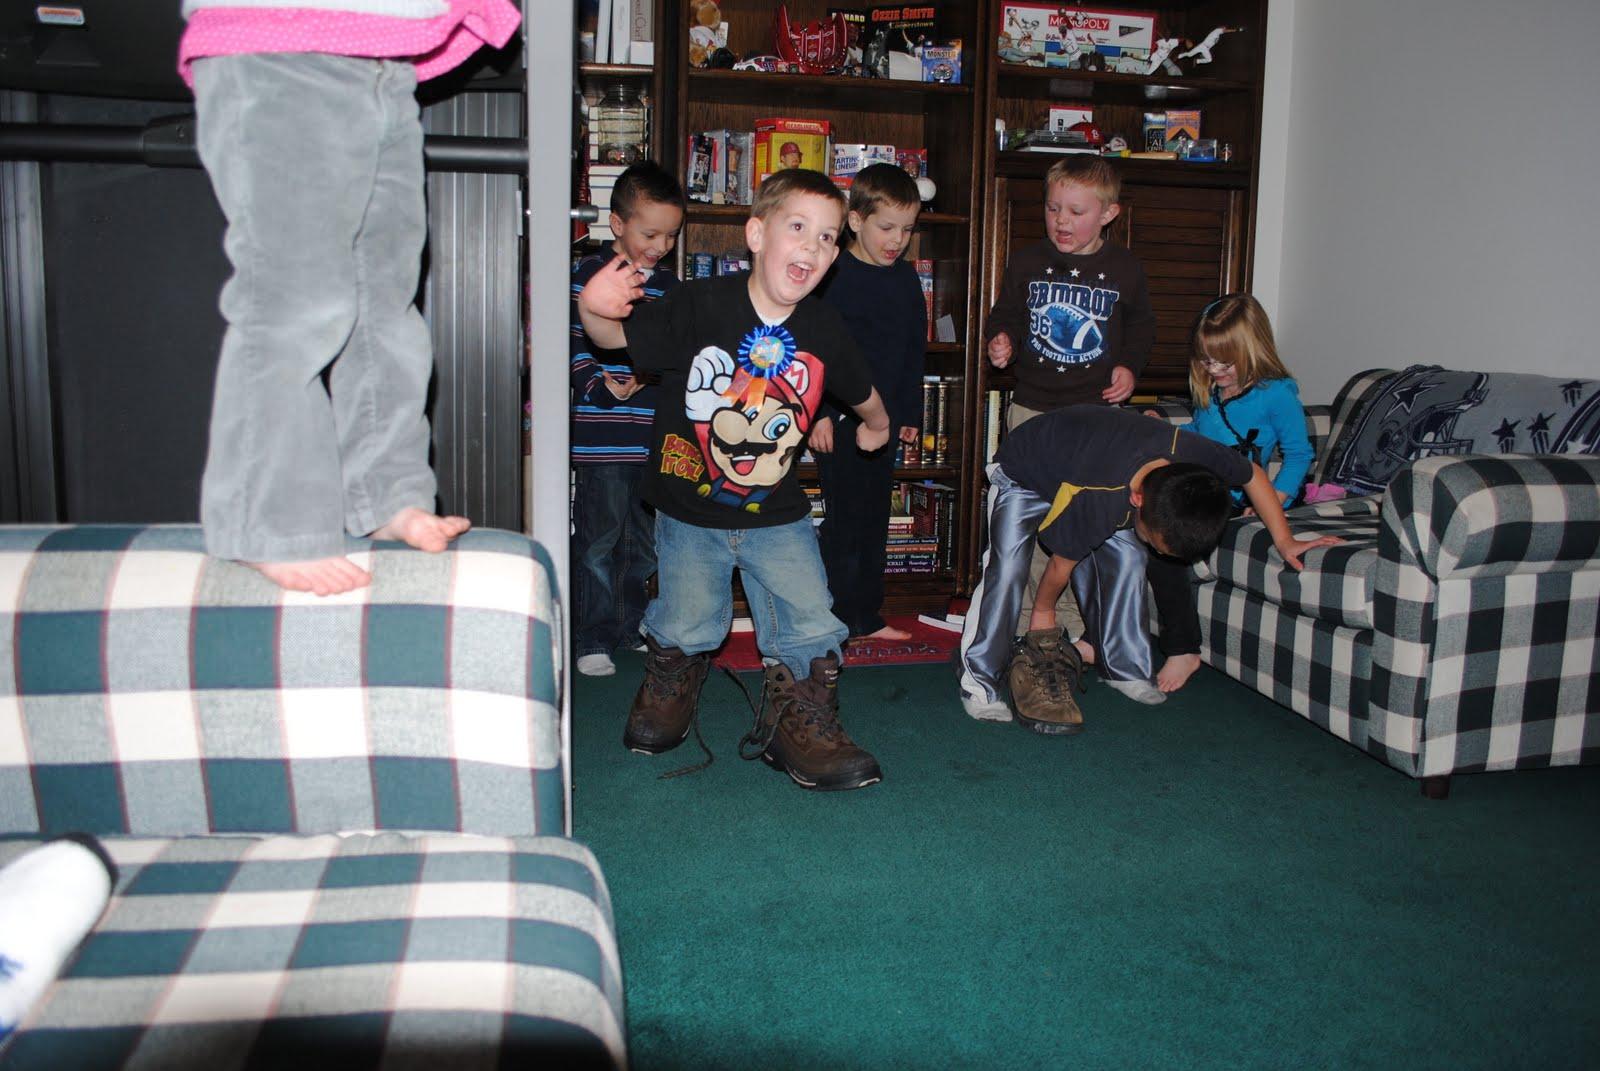 The Willes Clan Birthday Boy